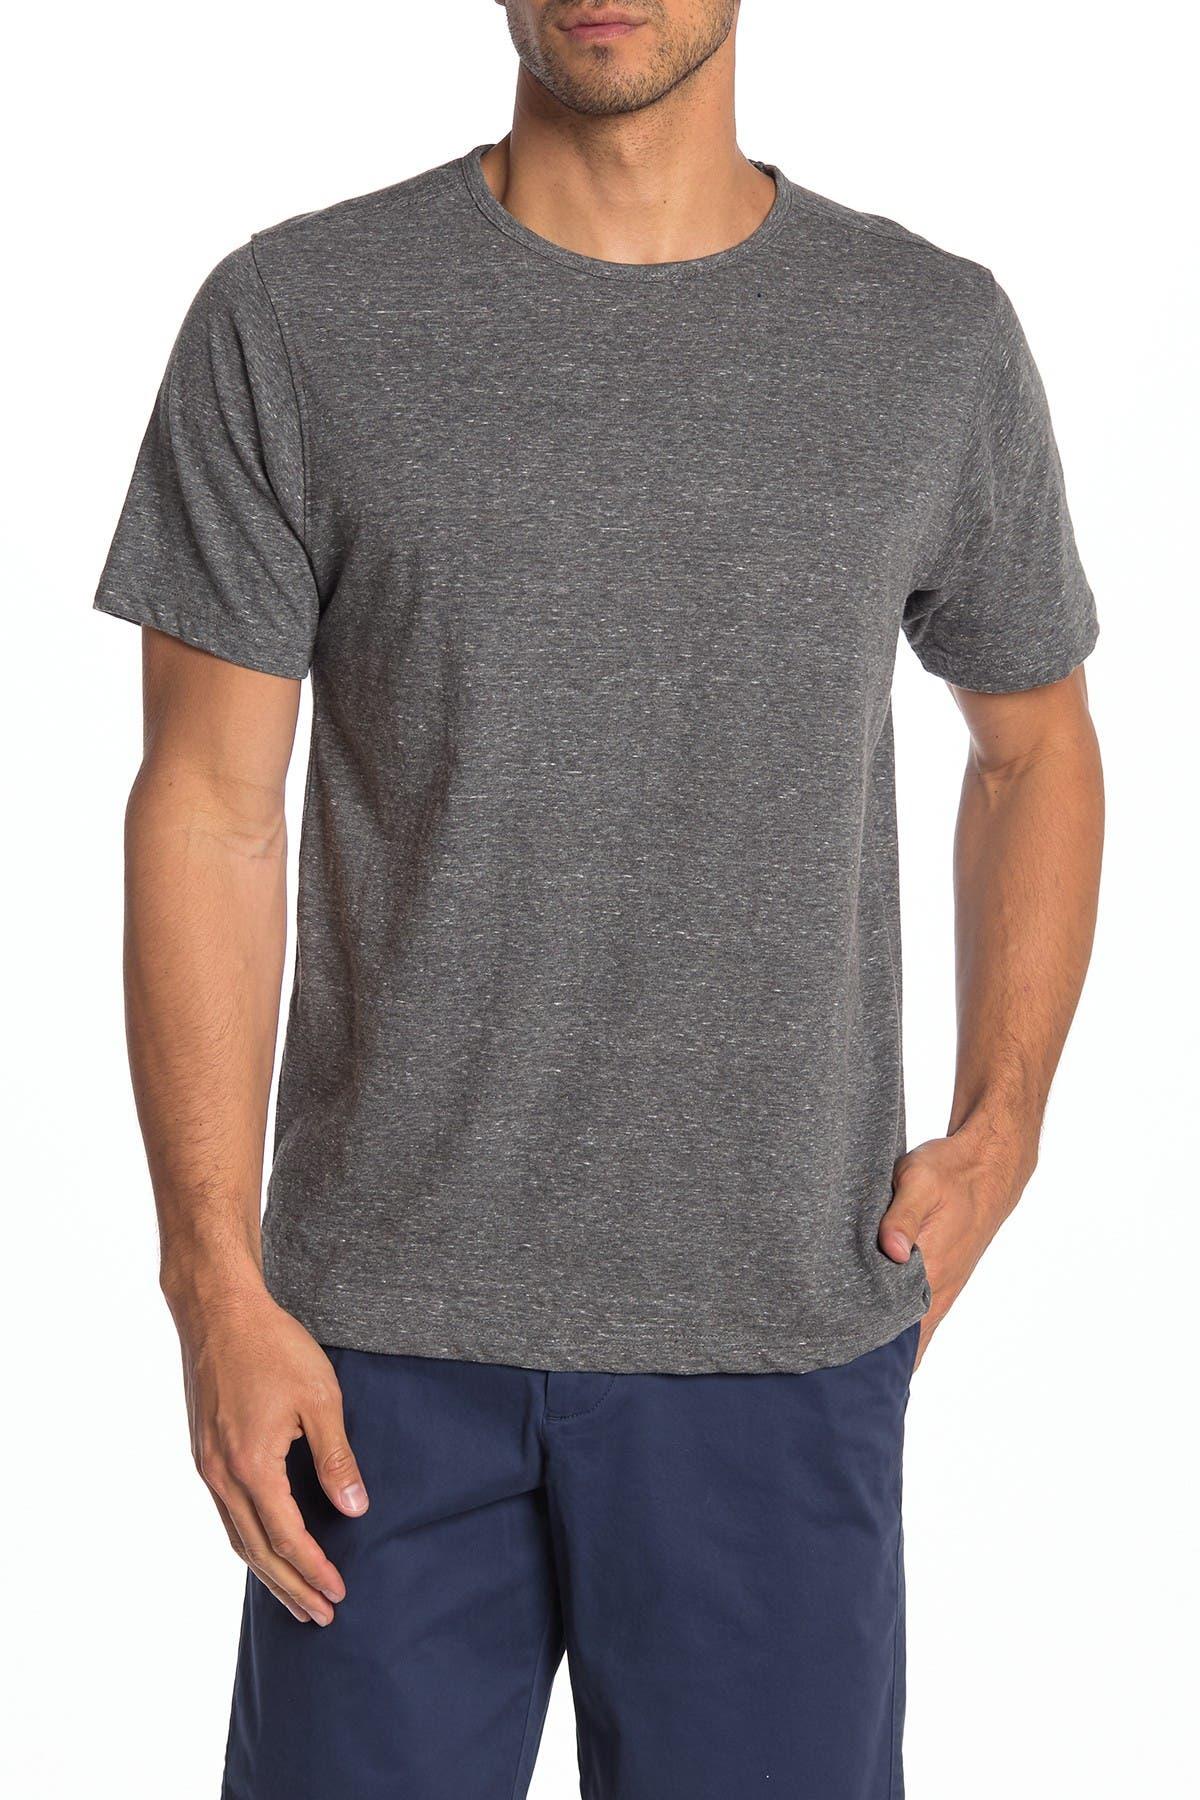 Image of COASTAORO Sieta Knit Short Sleeve Crew Neck T-Shirt